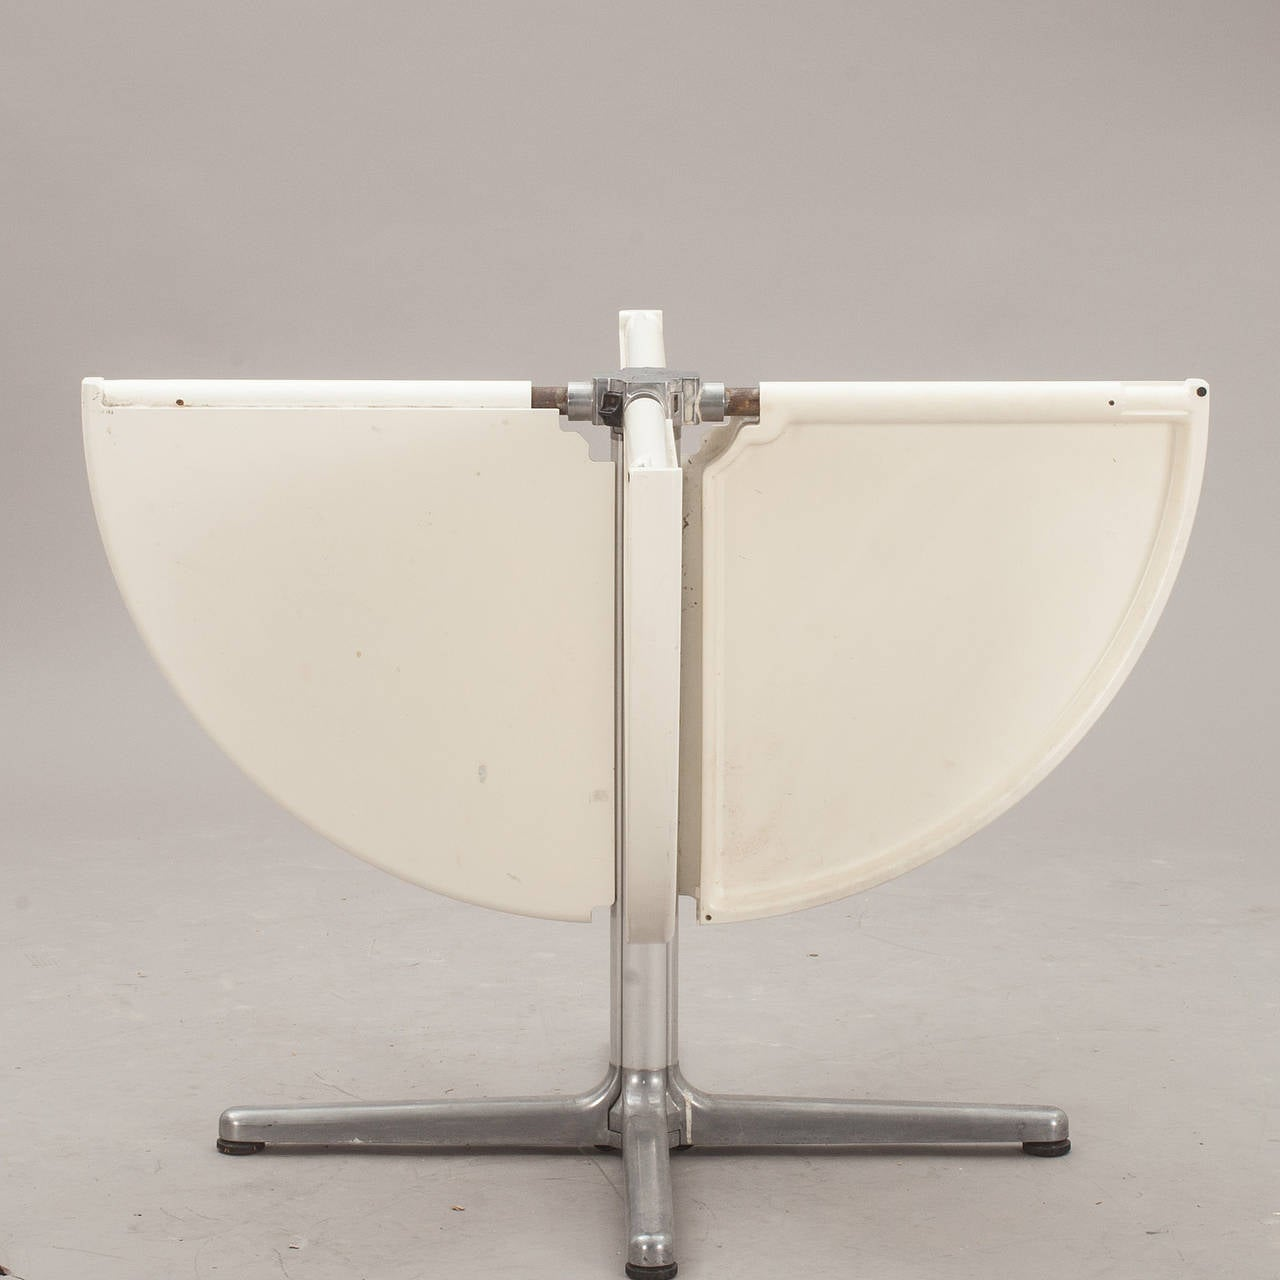 items similar to giancarlo piretti plana folding table by castelli